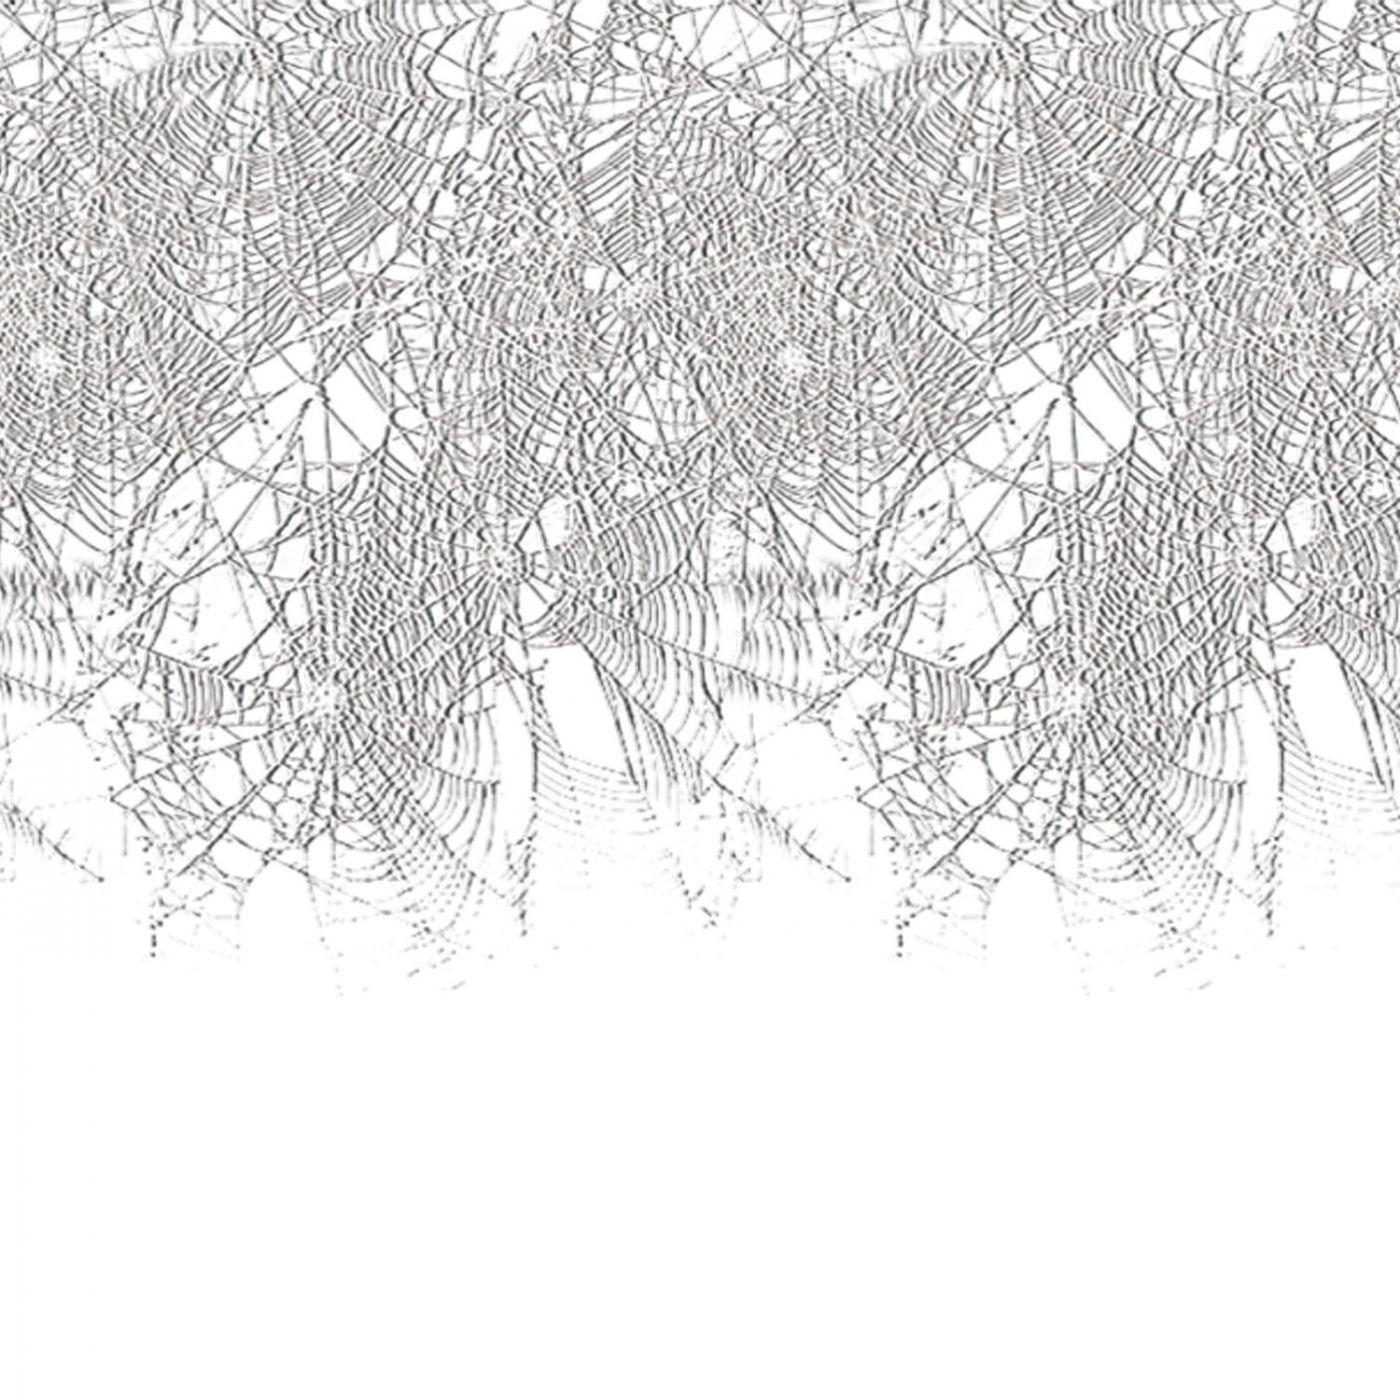 Spider Web Border (6) image